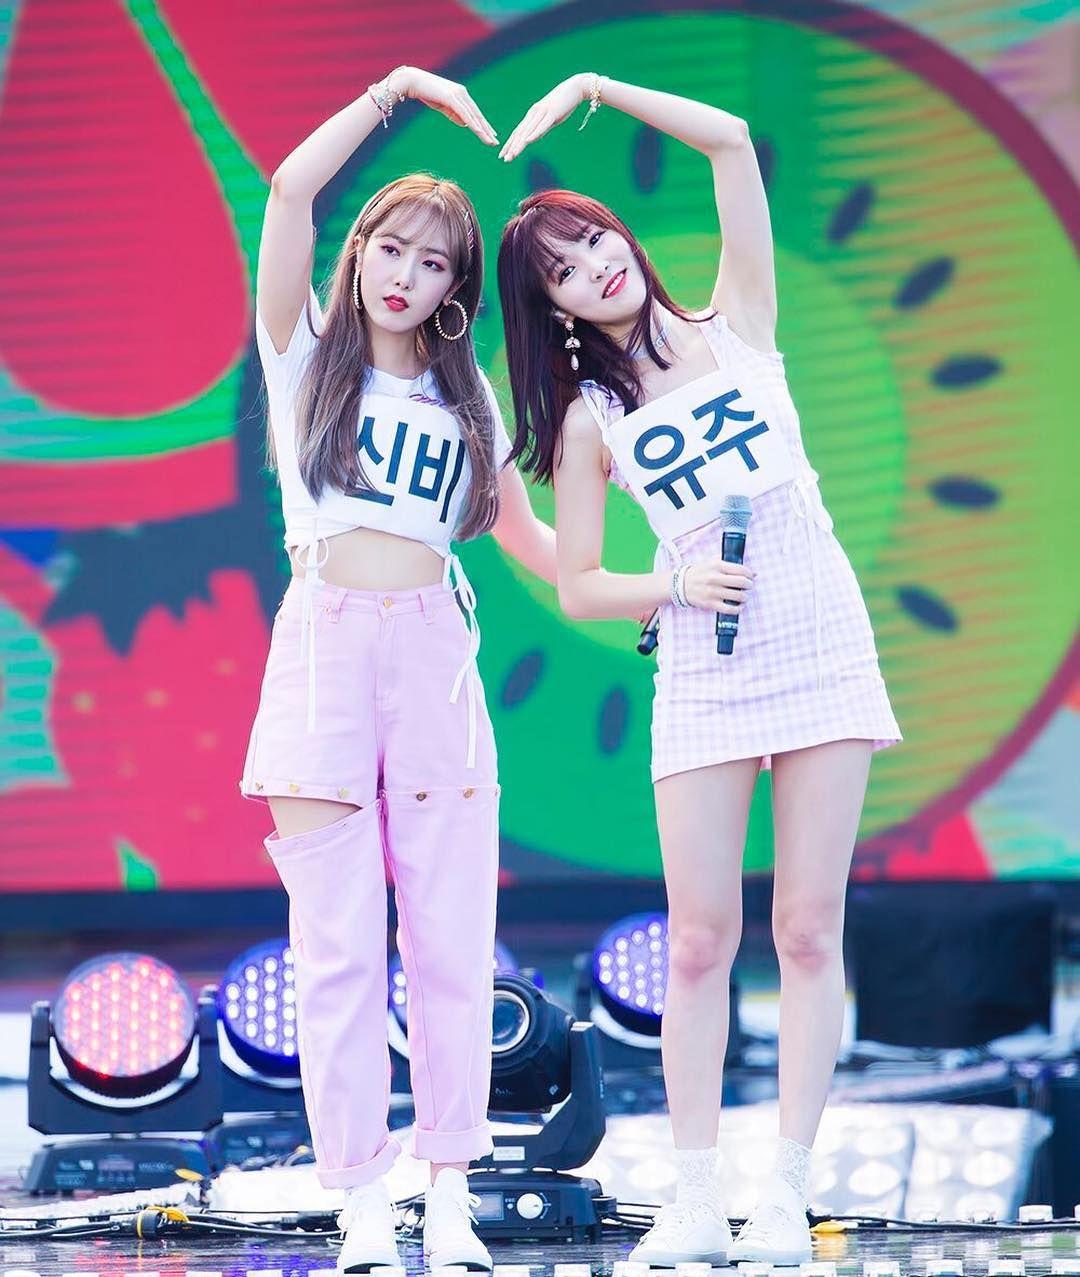 Yeojachingu Gfriend Kpop Idol Love Pretty Beautiful Amazing Gorgeous Stunning Sinb Yuju Girlgroup Artist Buddy Kpop Girls Sinb Gfriend South Korean Girls